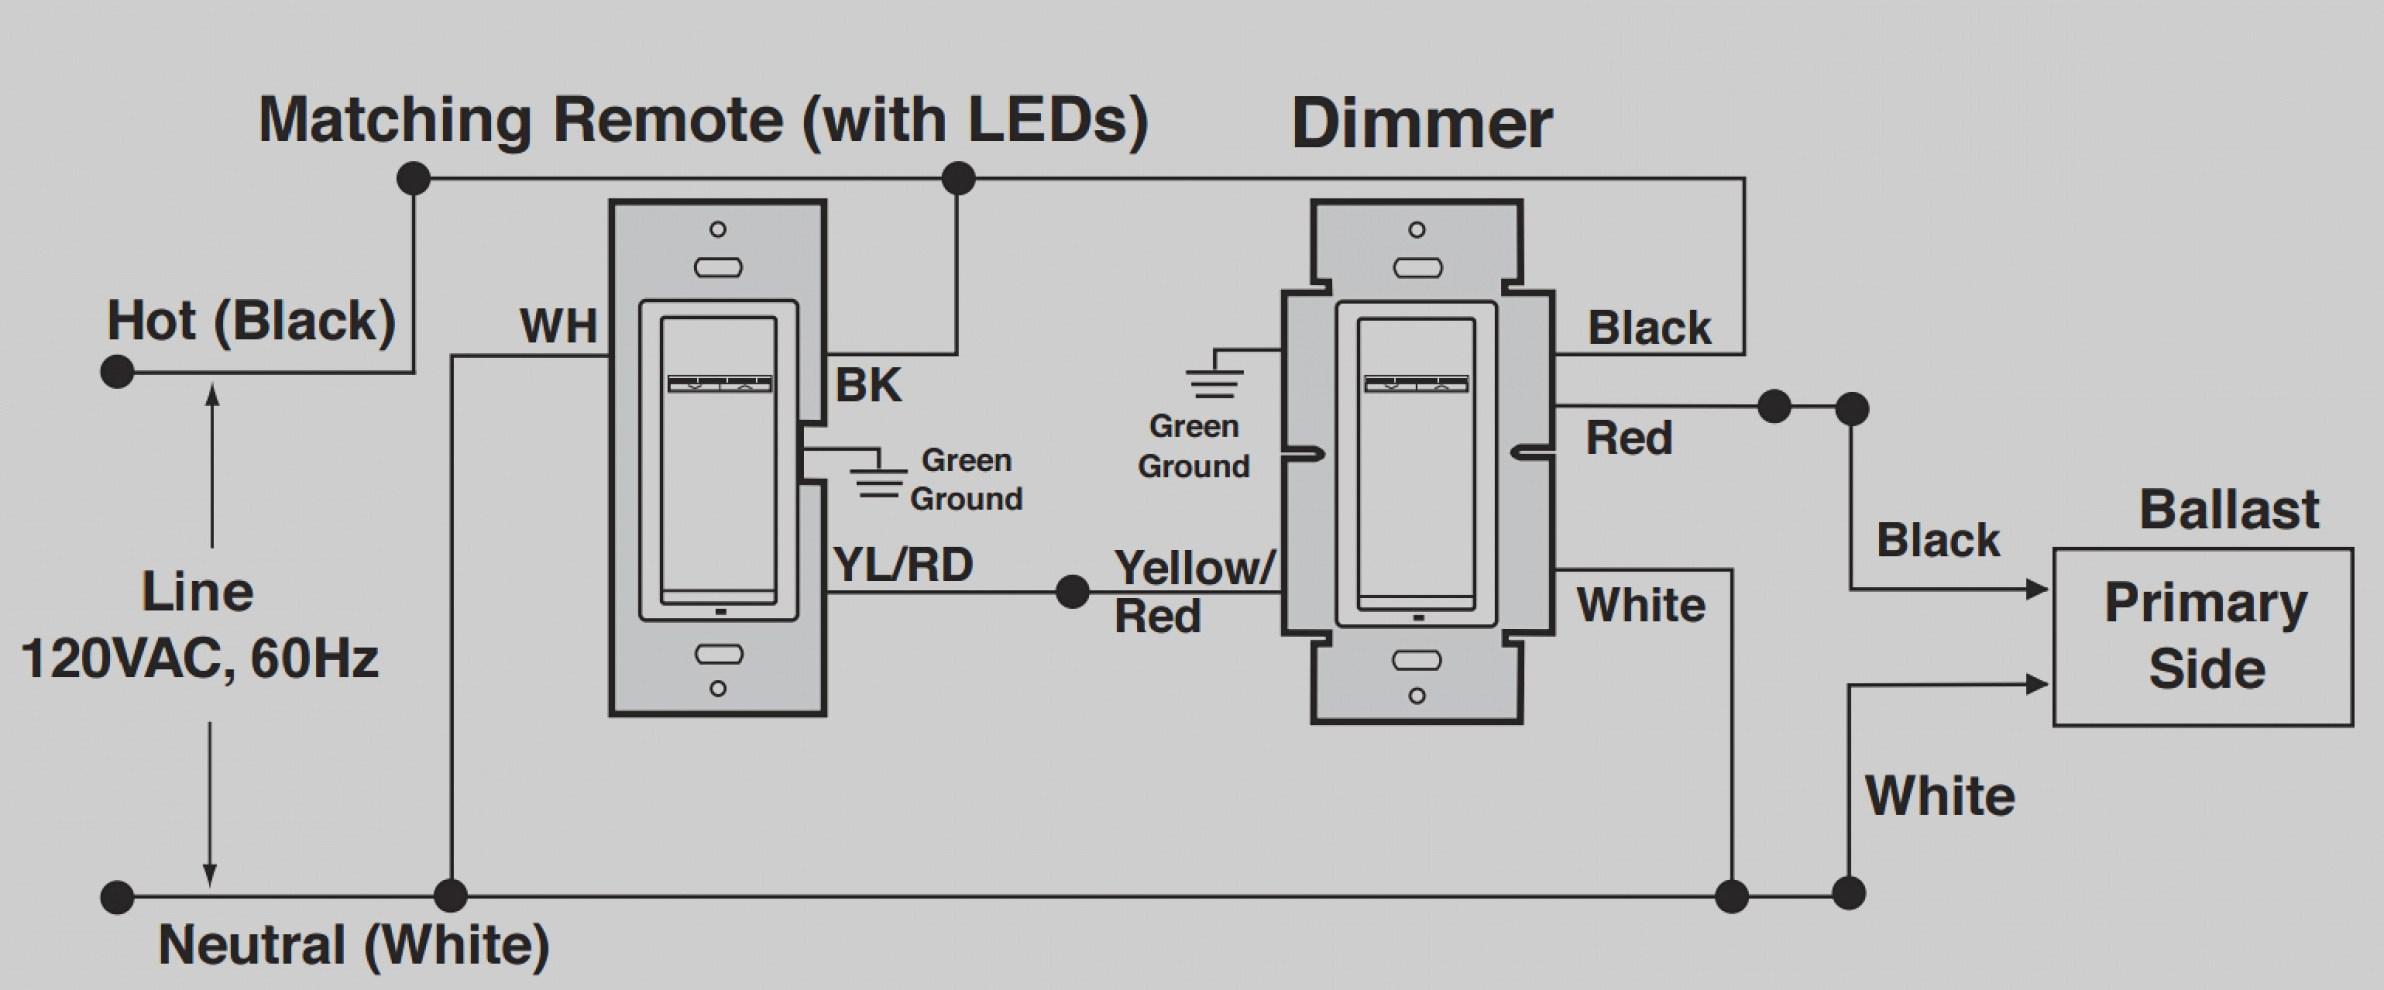 lutron ecosystem ballast wiring diagram lutron sensor lighting wiring diagram wiring diagram data  lutron sensor lighting wiring diagram